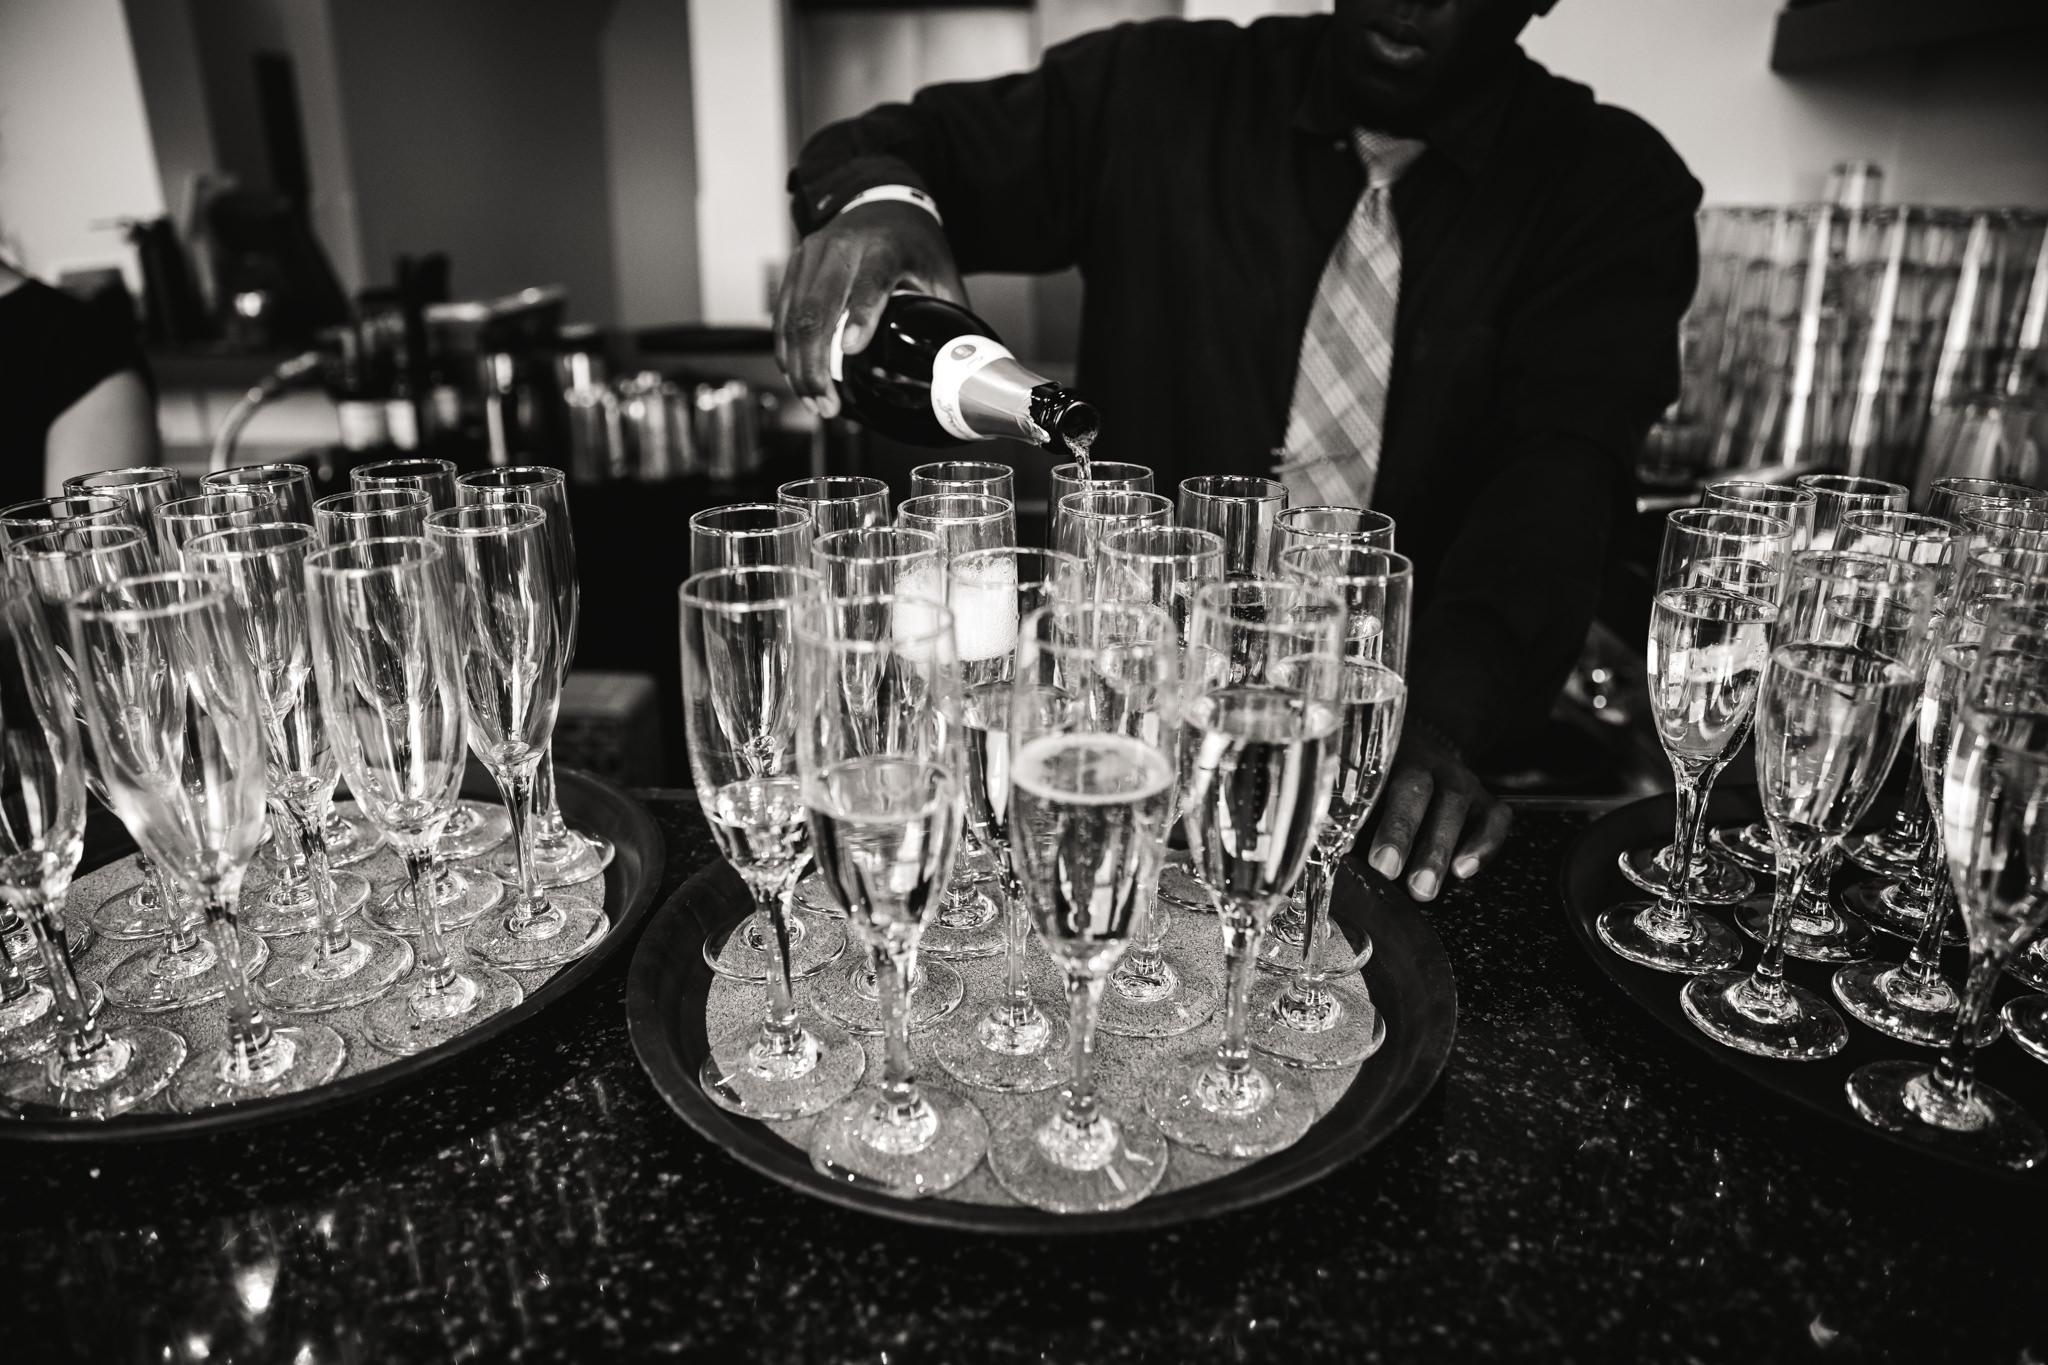 phantom-canyon-brewery-colorado-springs-wedding-photographer-5.jpg